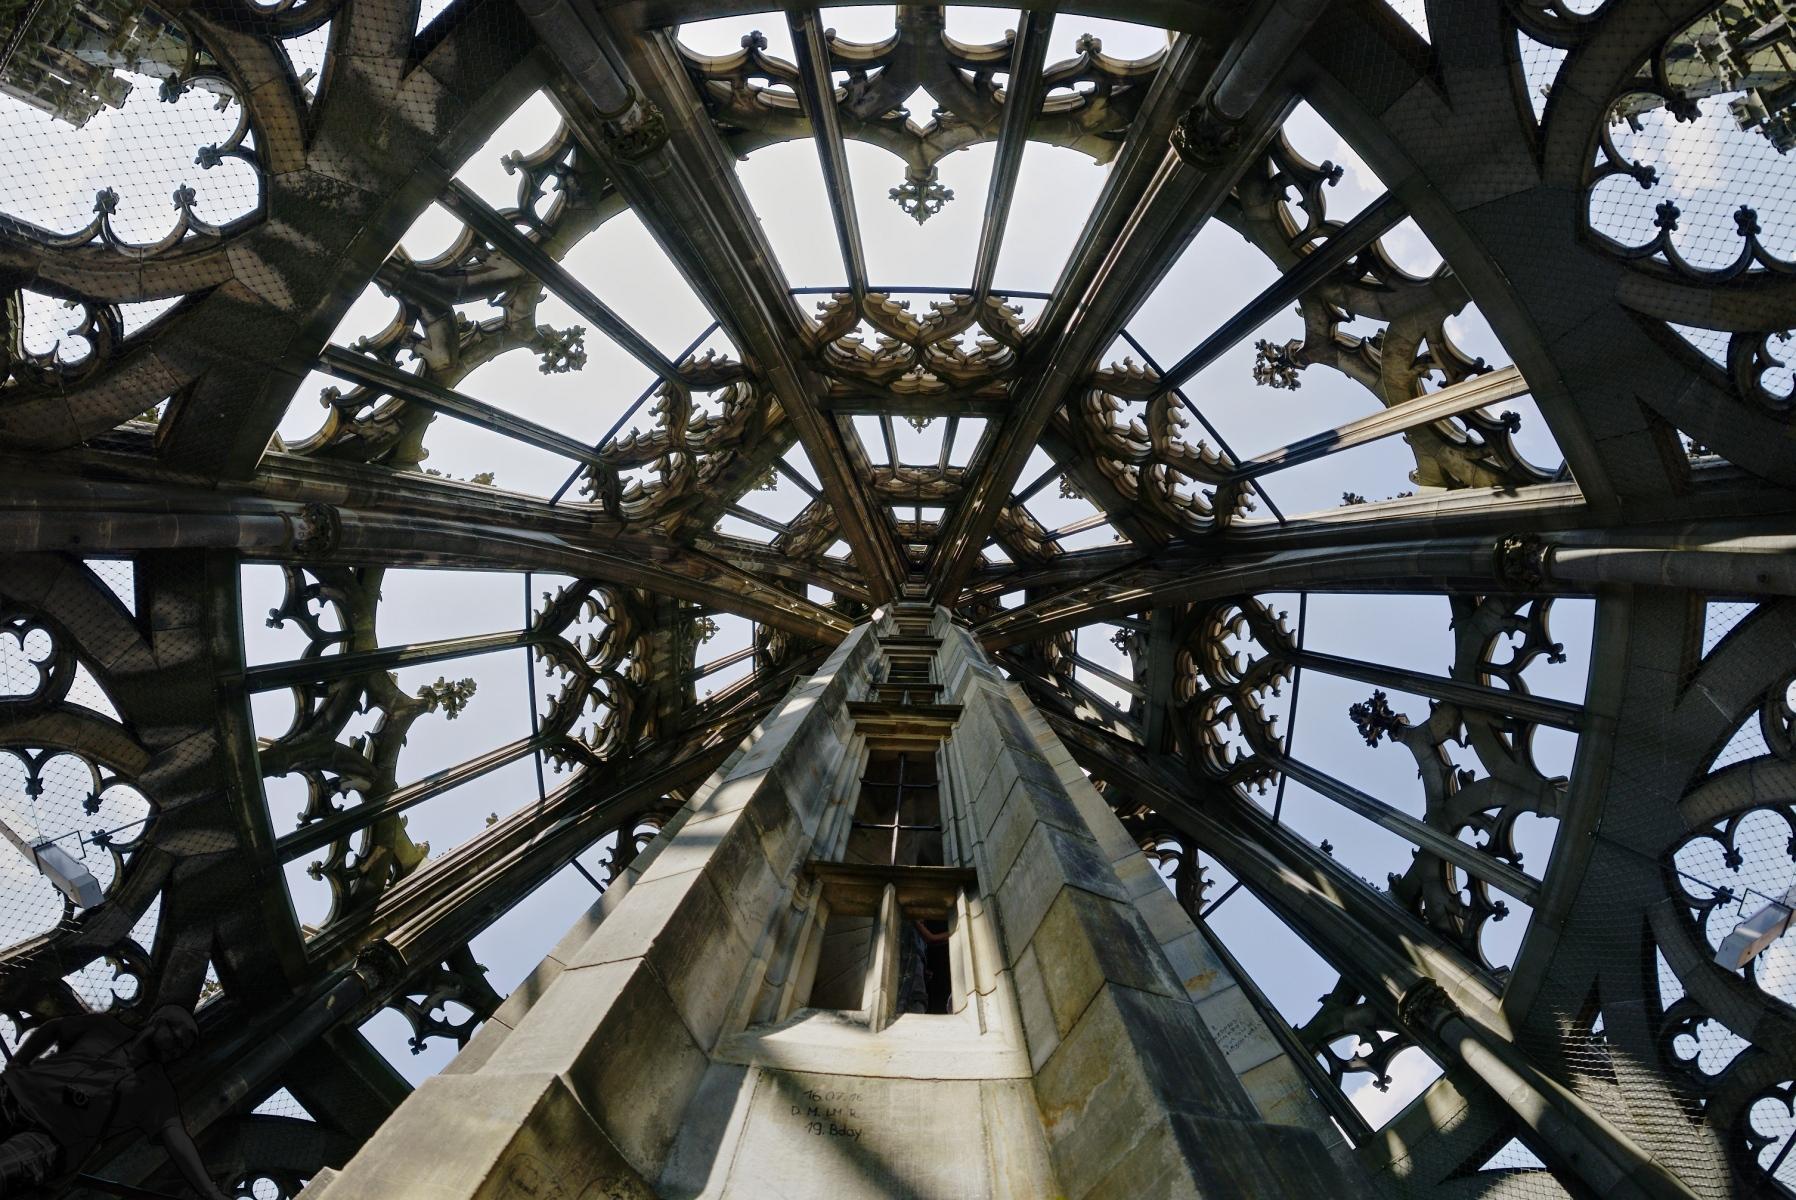 DSC03442-Münsterturm-Blick-nach-oben-Samyang-12mm-Fisheye-HDR-50p